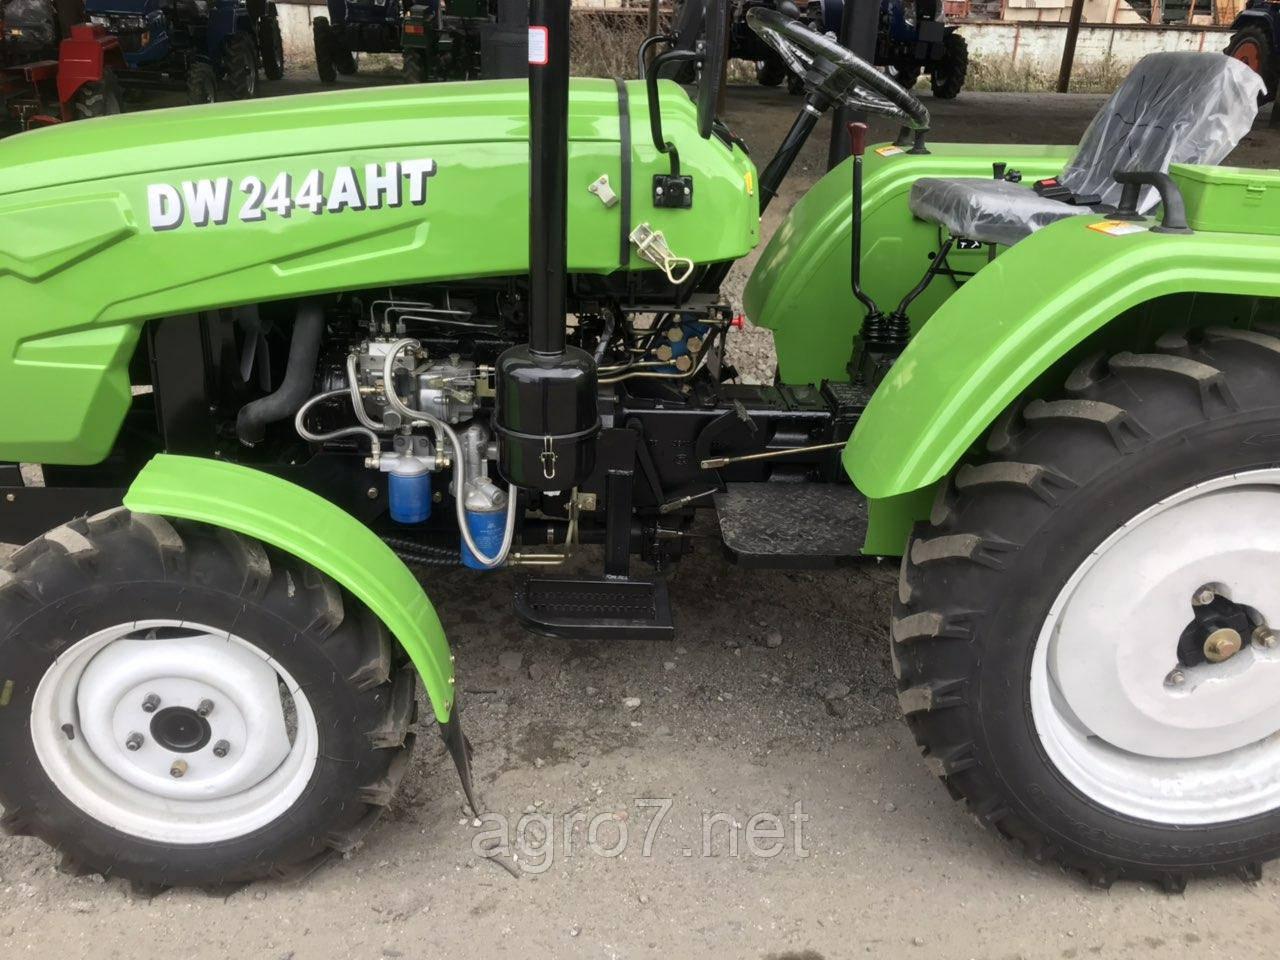 Трактор с доставкой DW 244 AHT (3 цил., 4х4, 24л.с., ГУР)